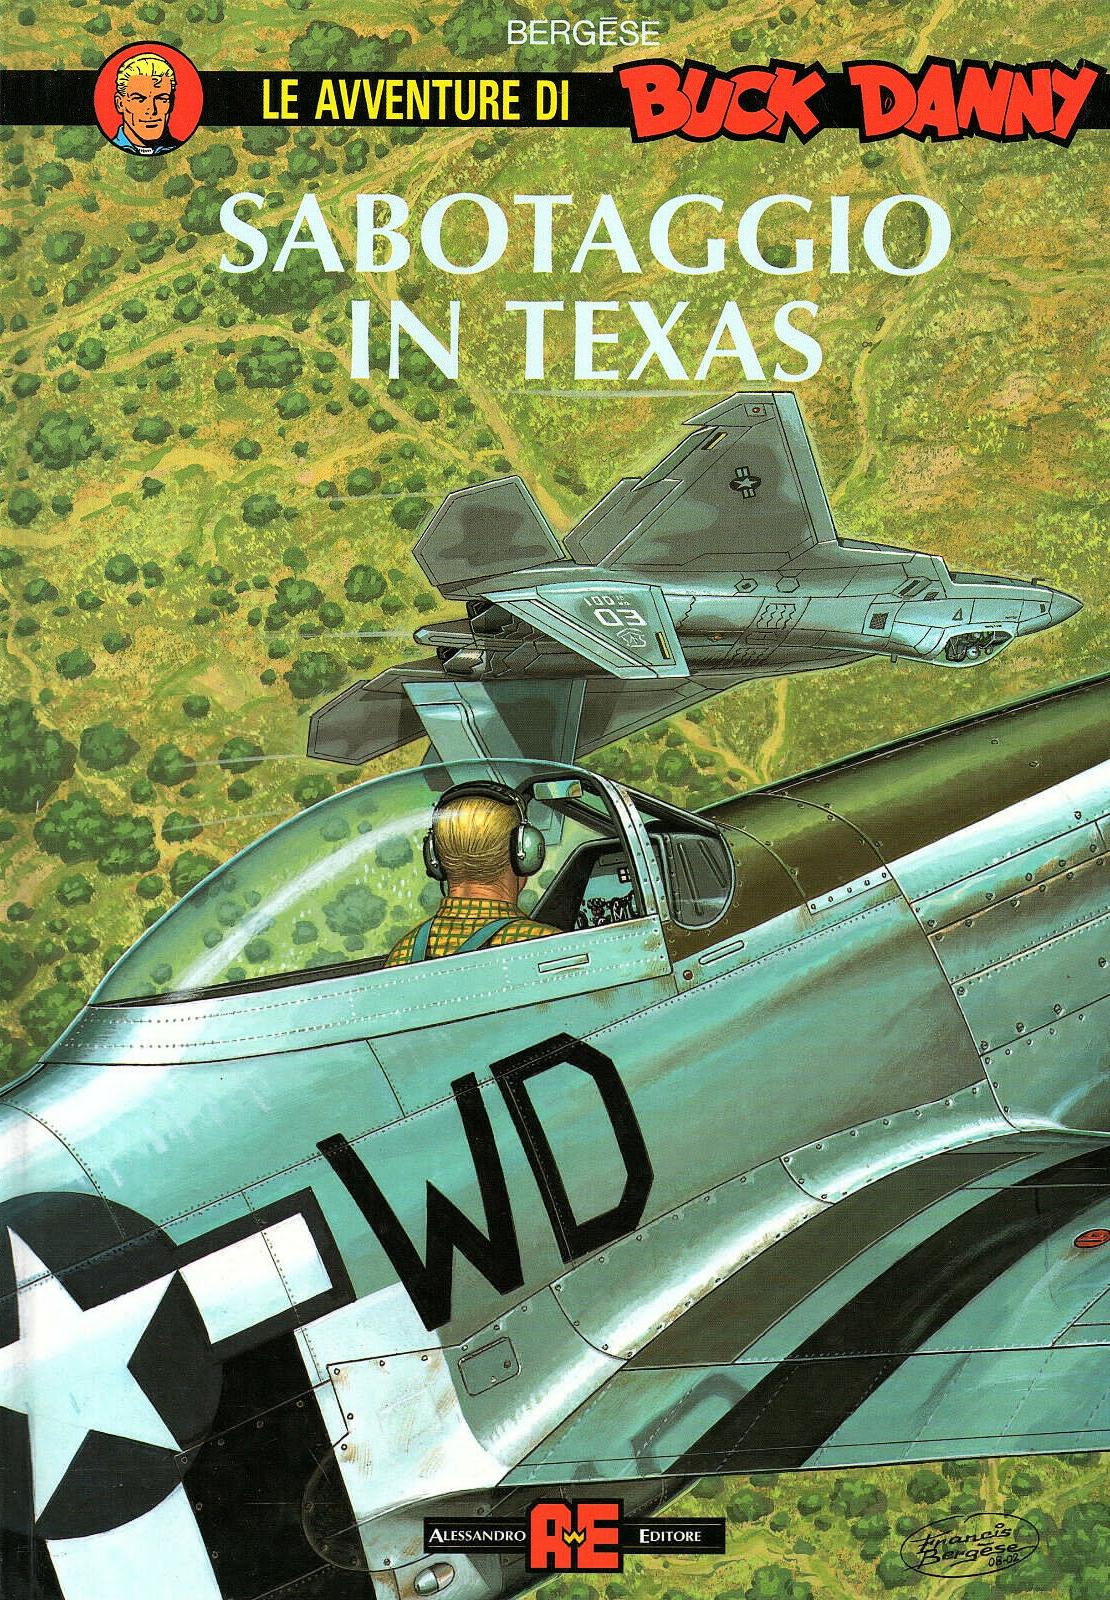 Sabotaggio in Texas